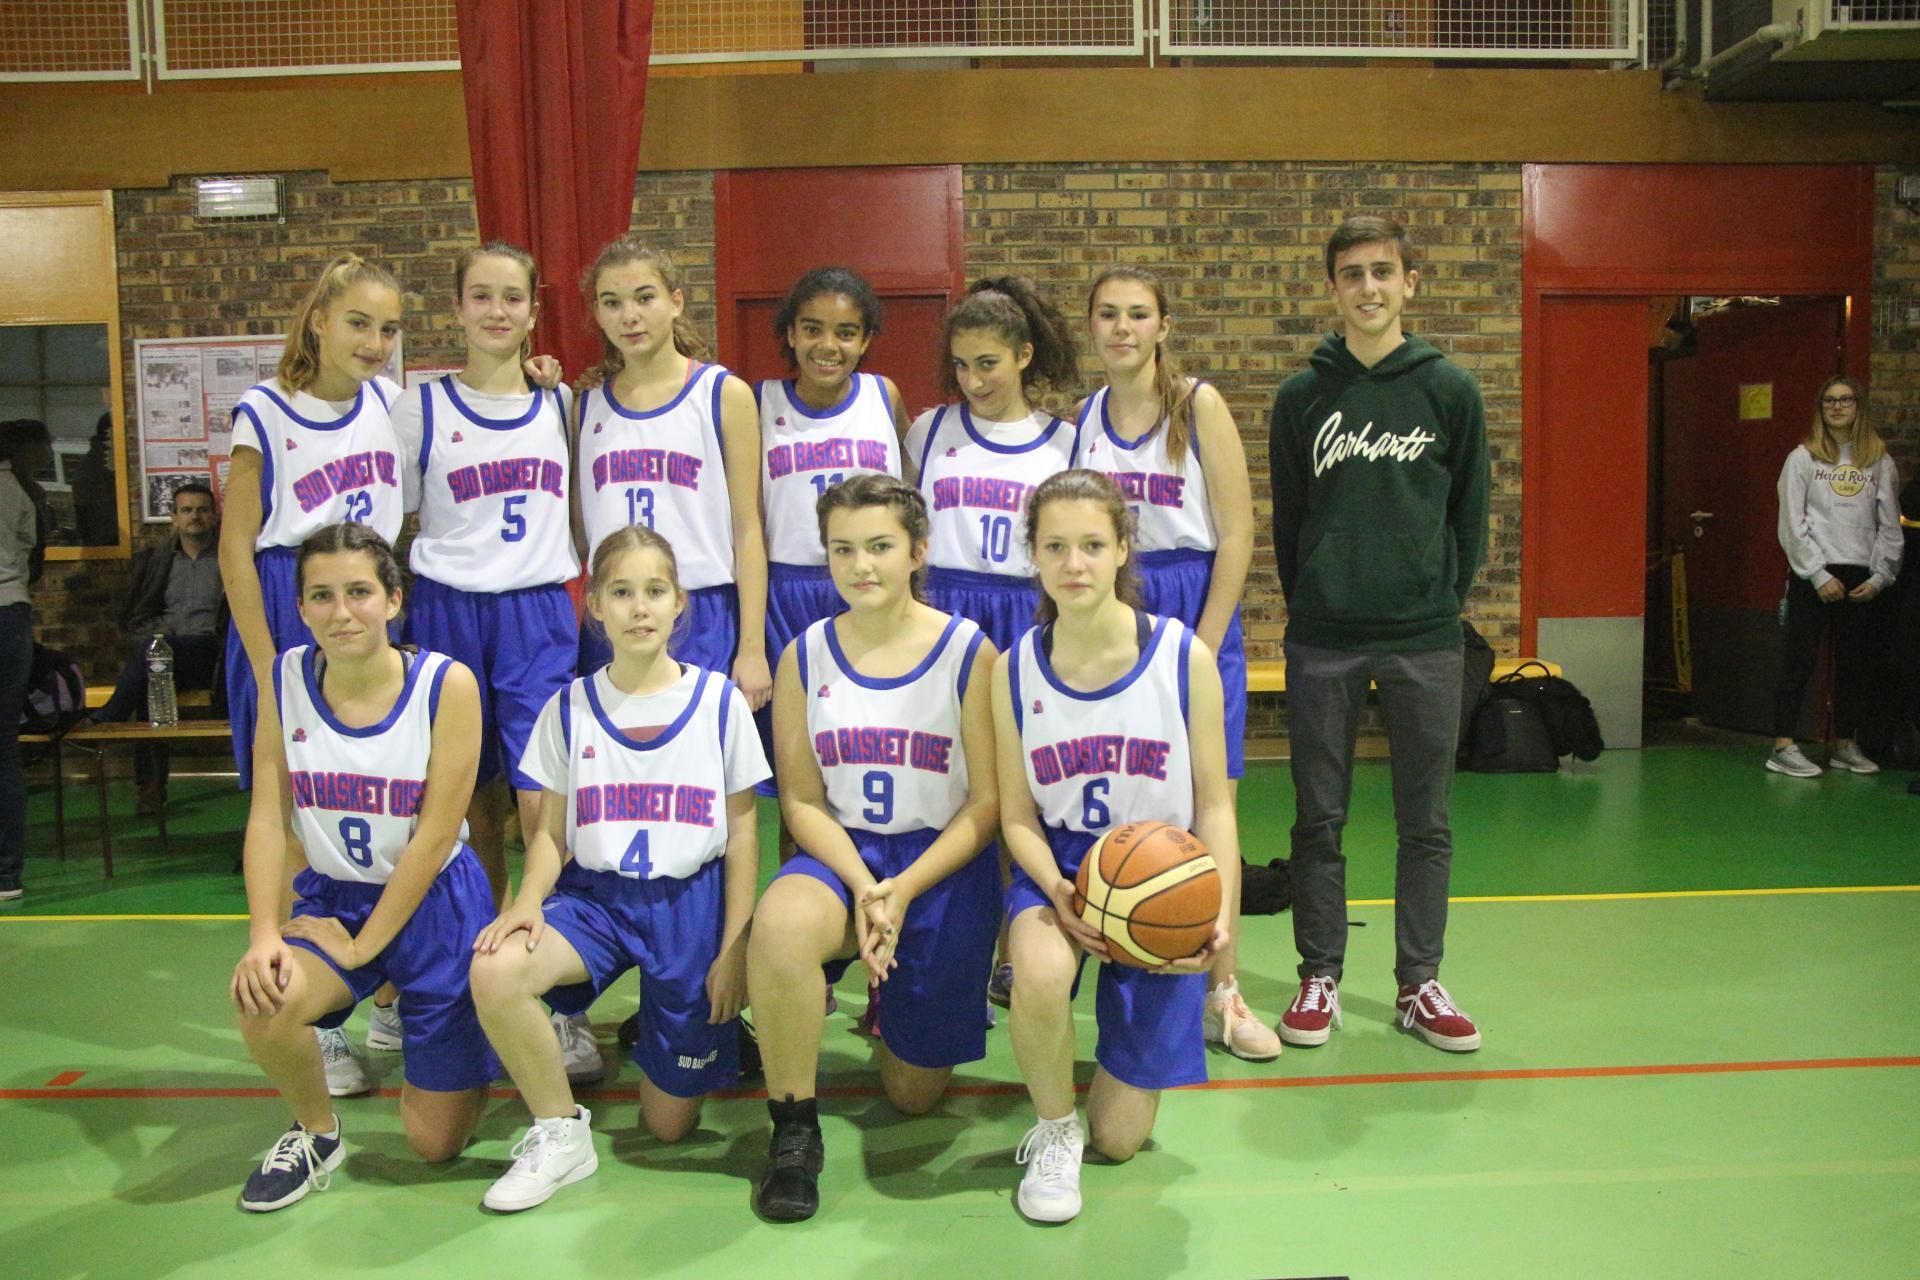 U15F Sud Basket Oise Saison 2018-2019